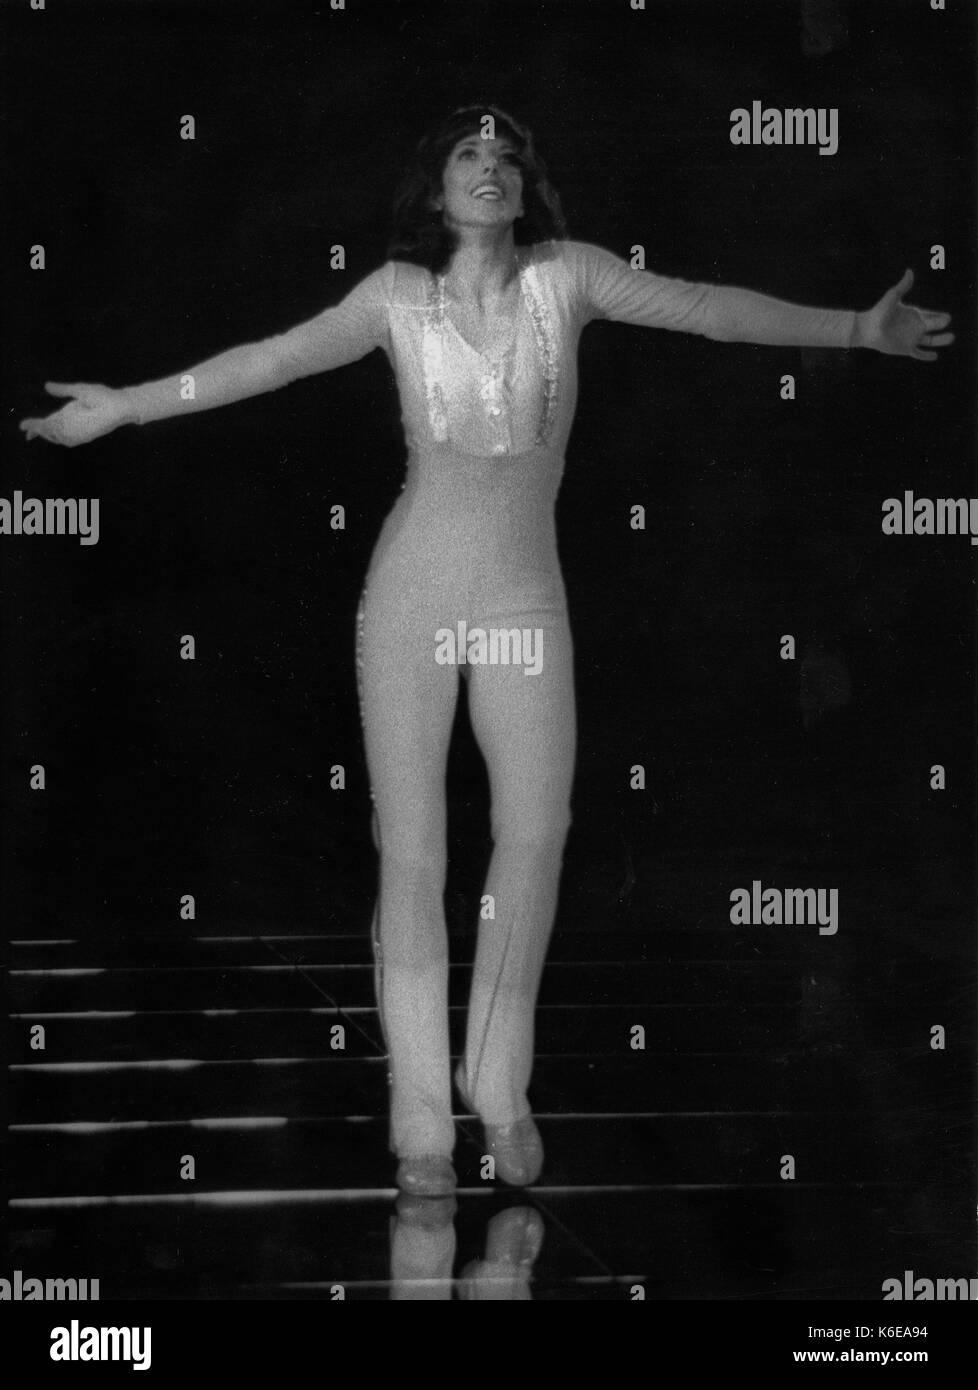 Sue Ramirez (b. 1996) images